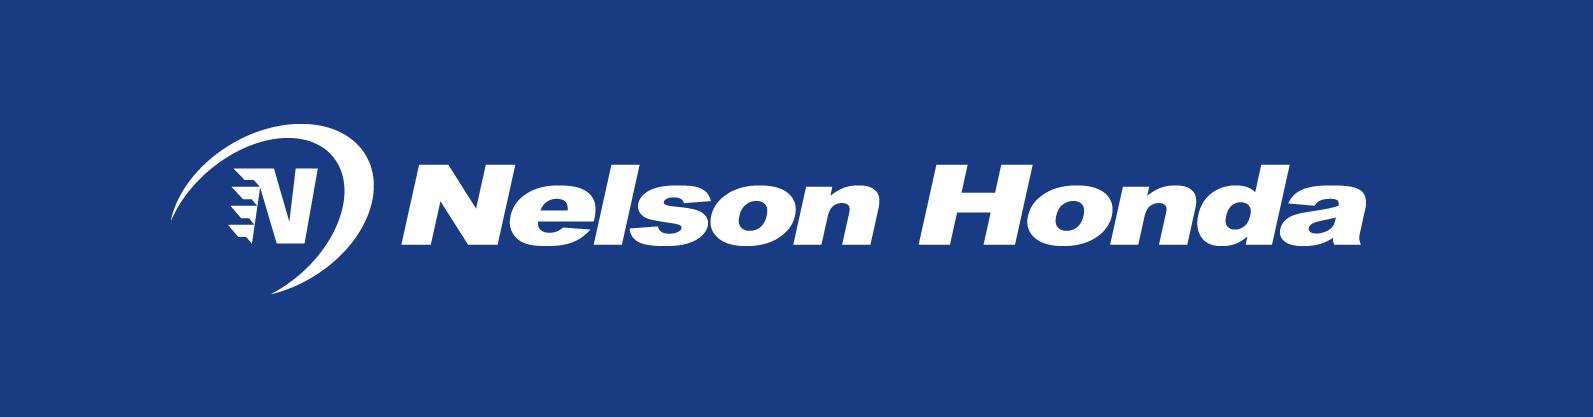 Nelson honda in el monte ca 91731 for Nelson honda el monte